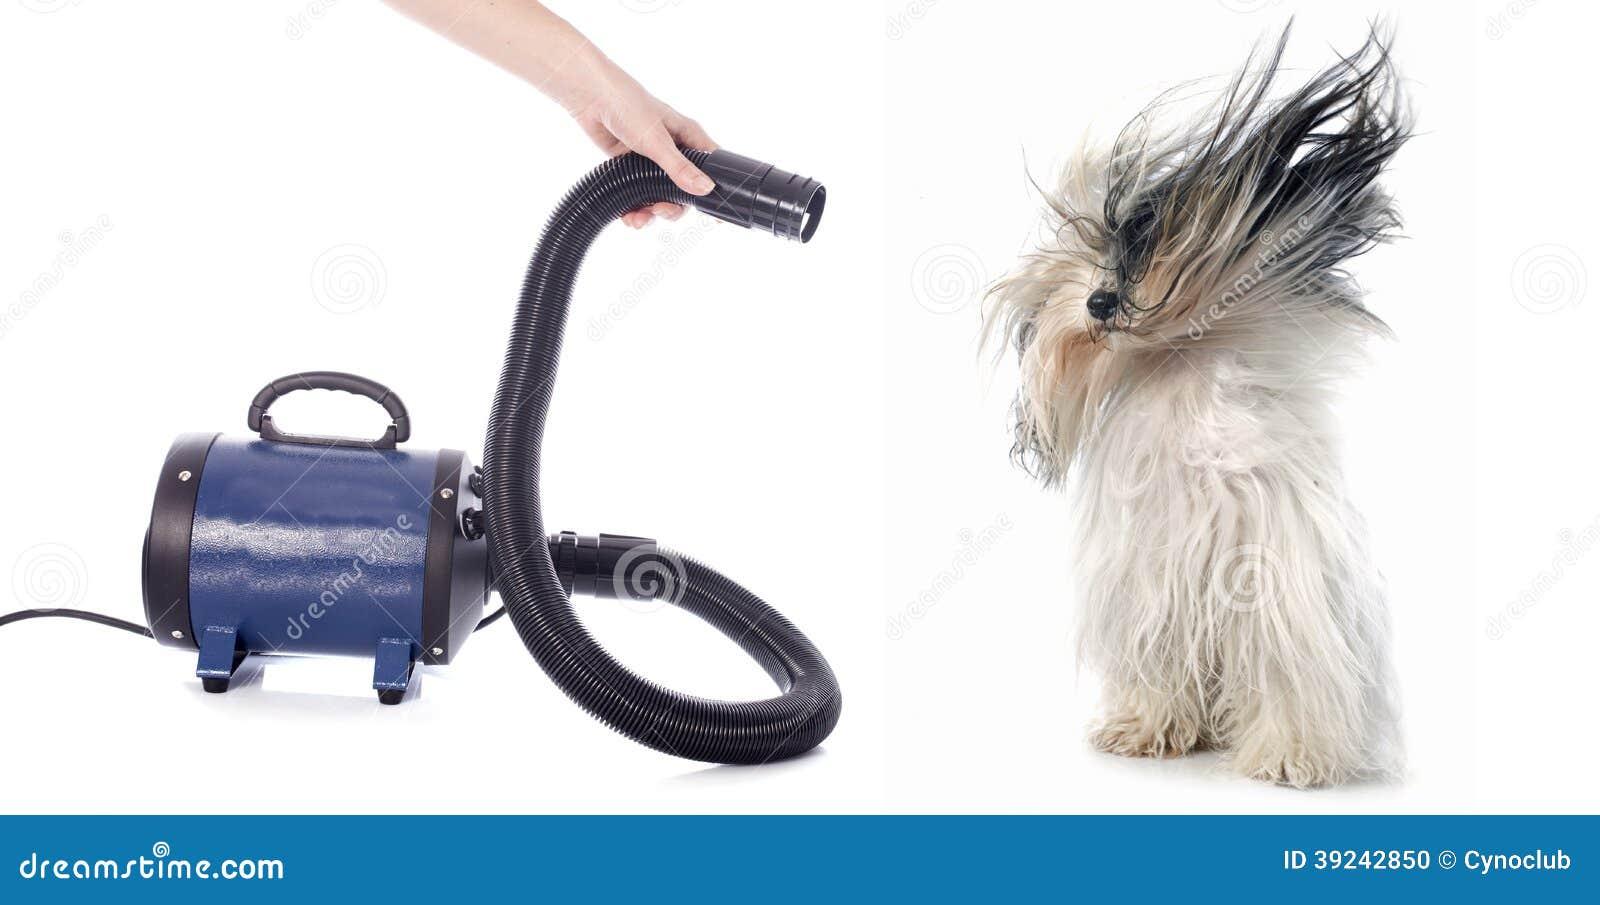 Hair dryer for dog